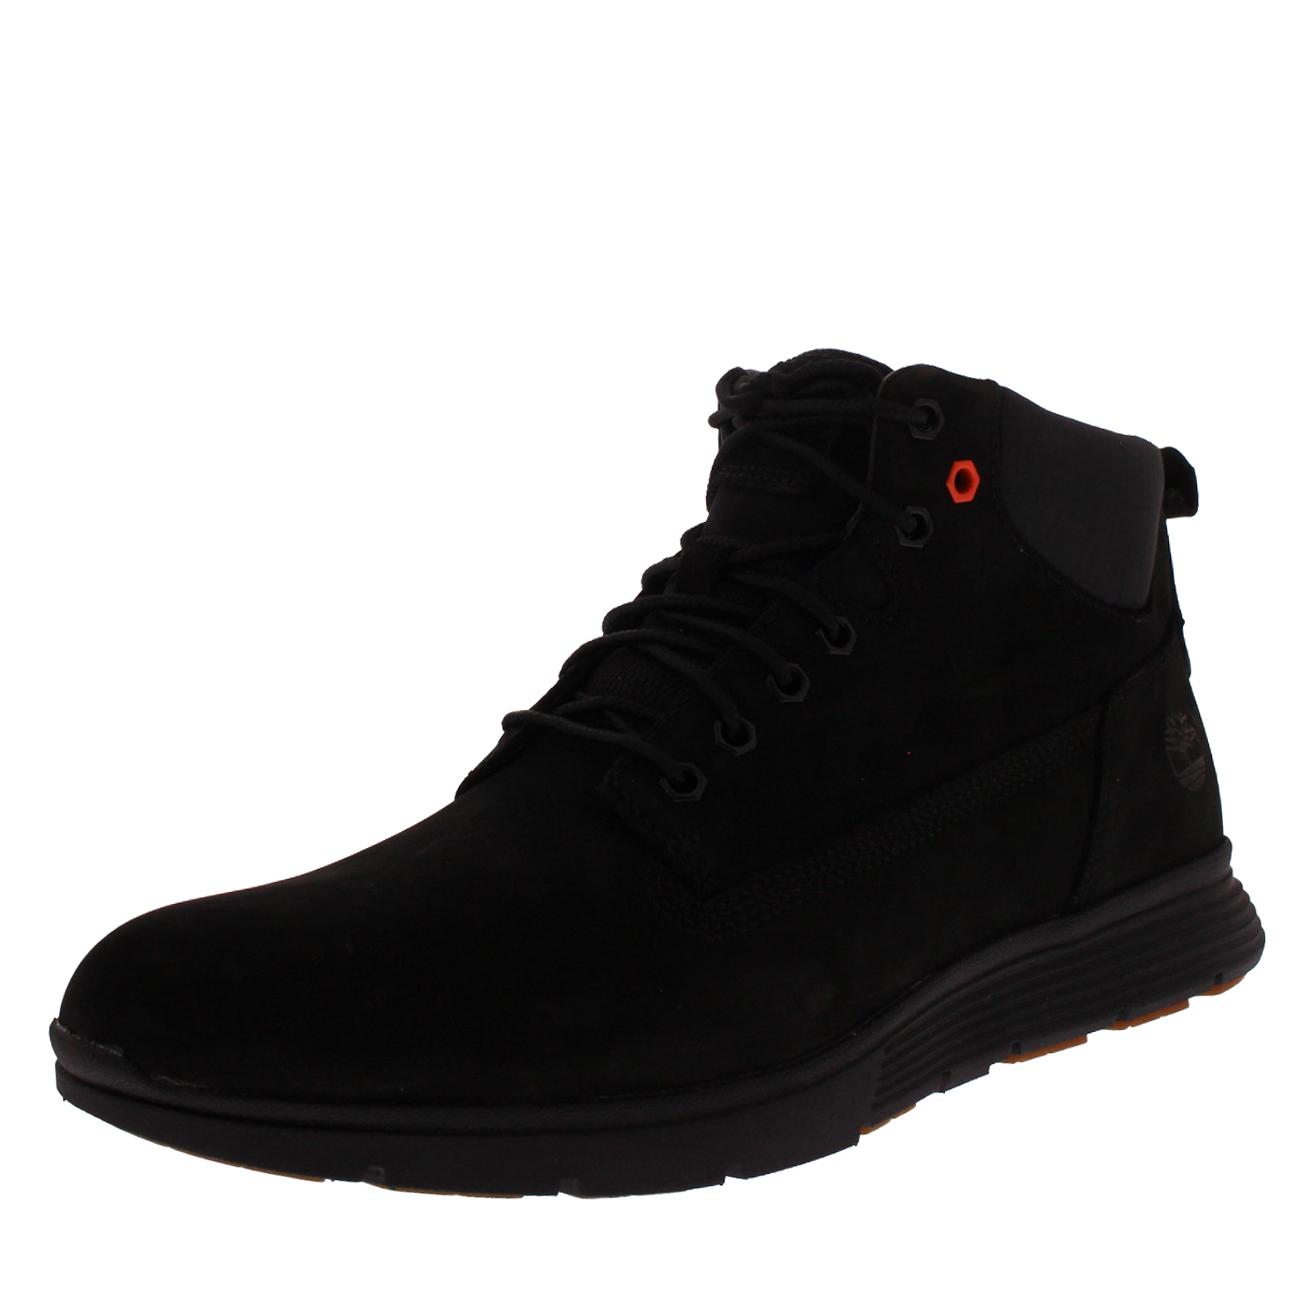 82e2c4a74db8 Mens Timberland Killington Chukka Outdoor Walking Nubuck Ankle Boots US  6.5-13.5